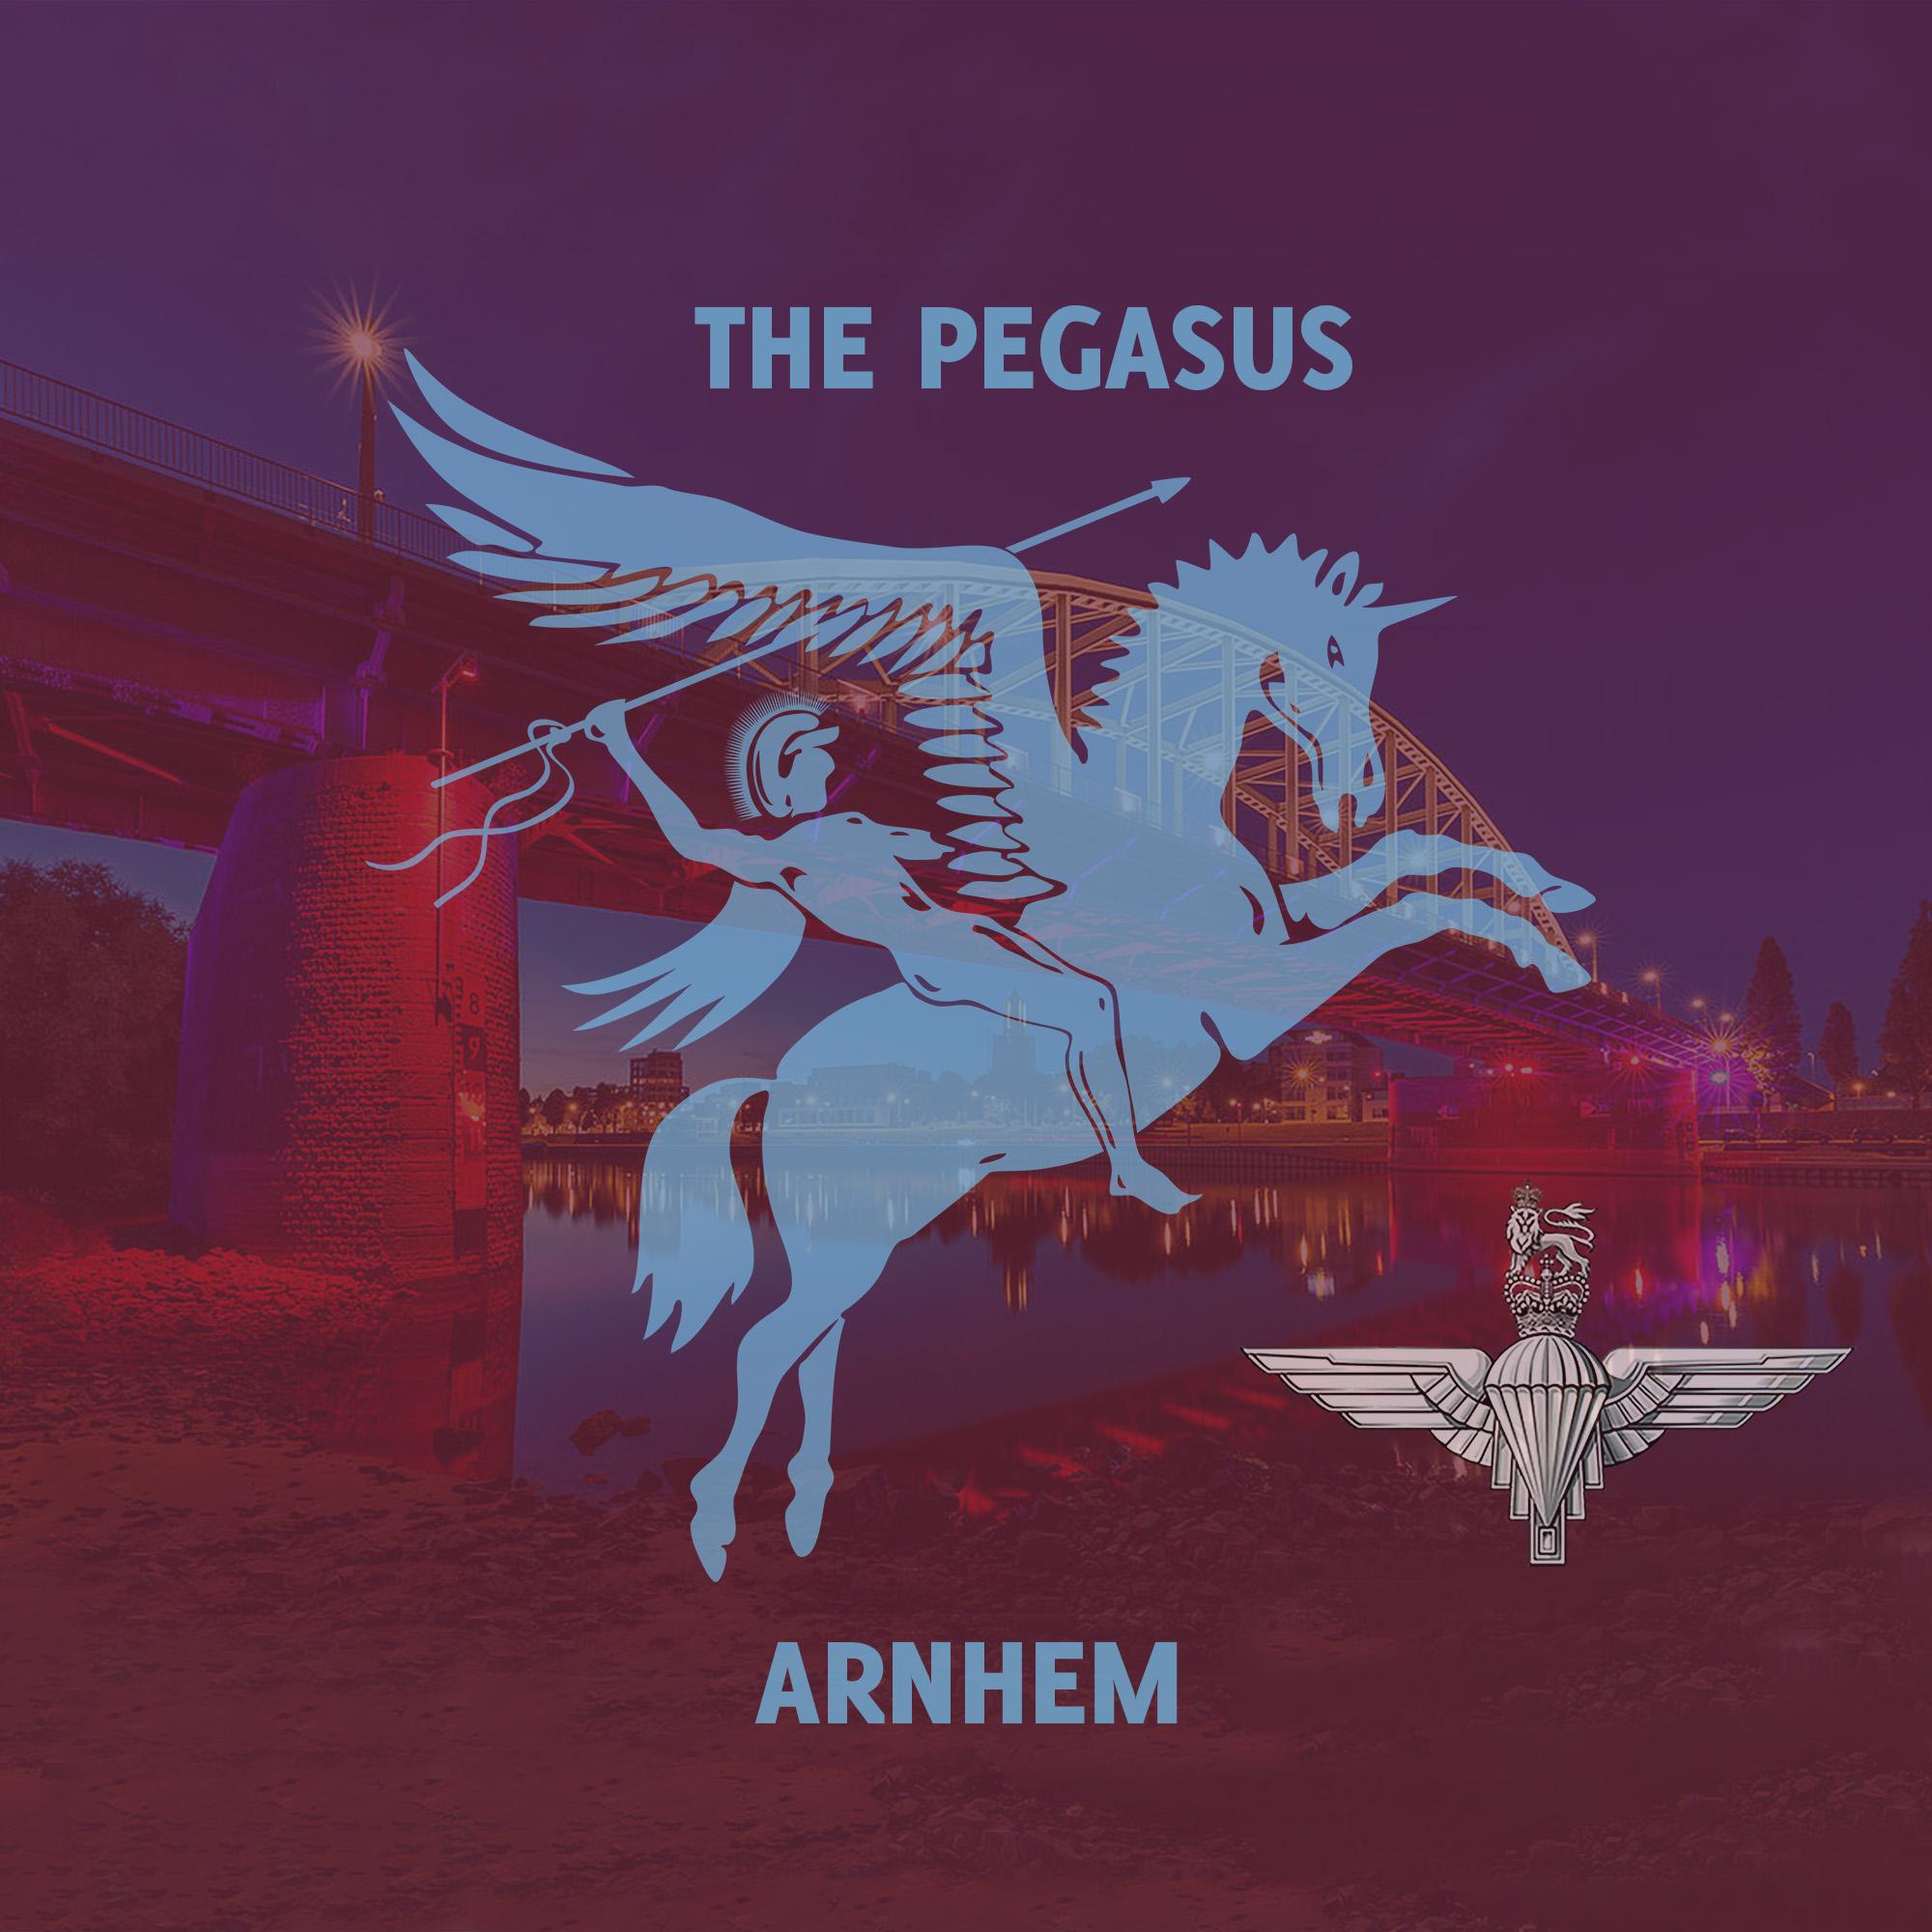 The Pegasus Arnhem